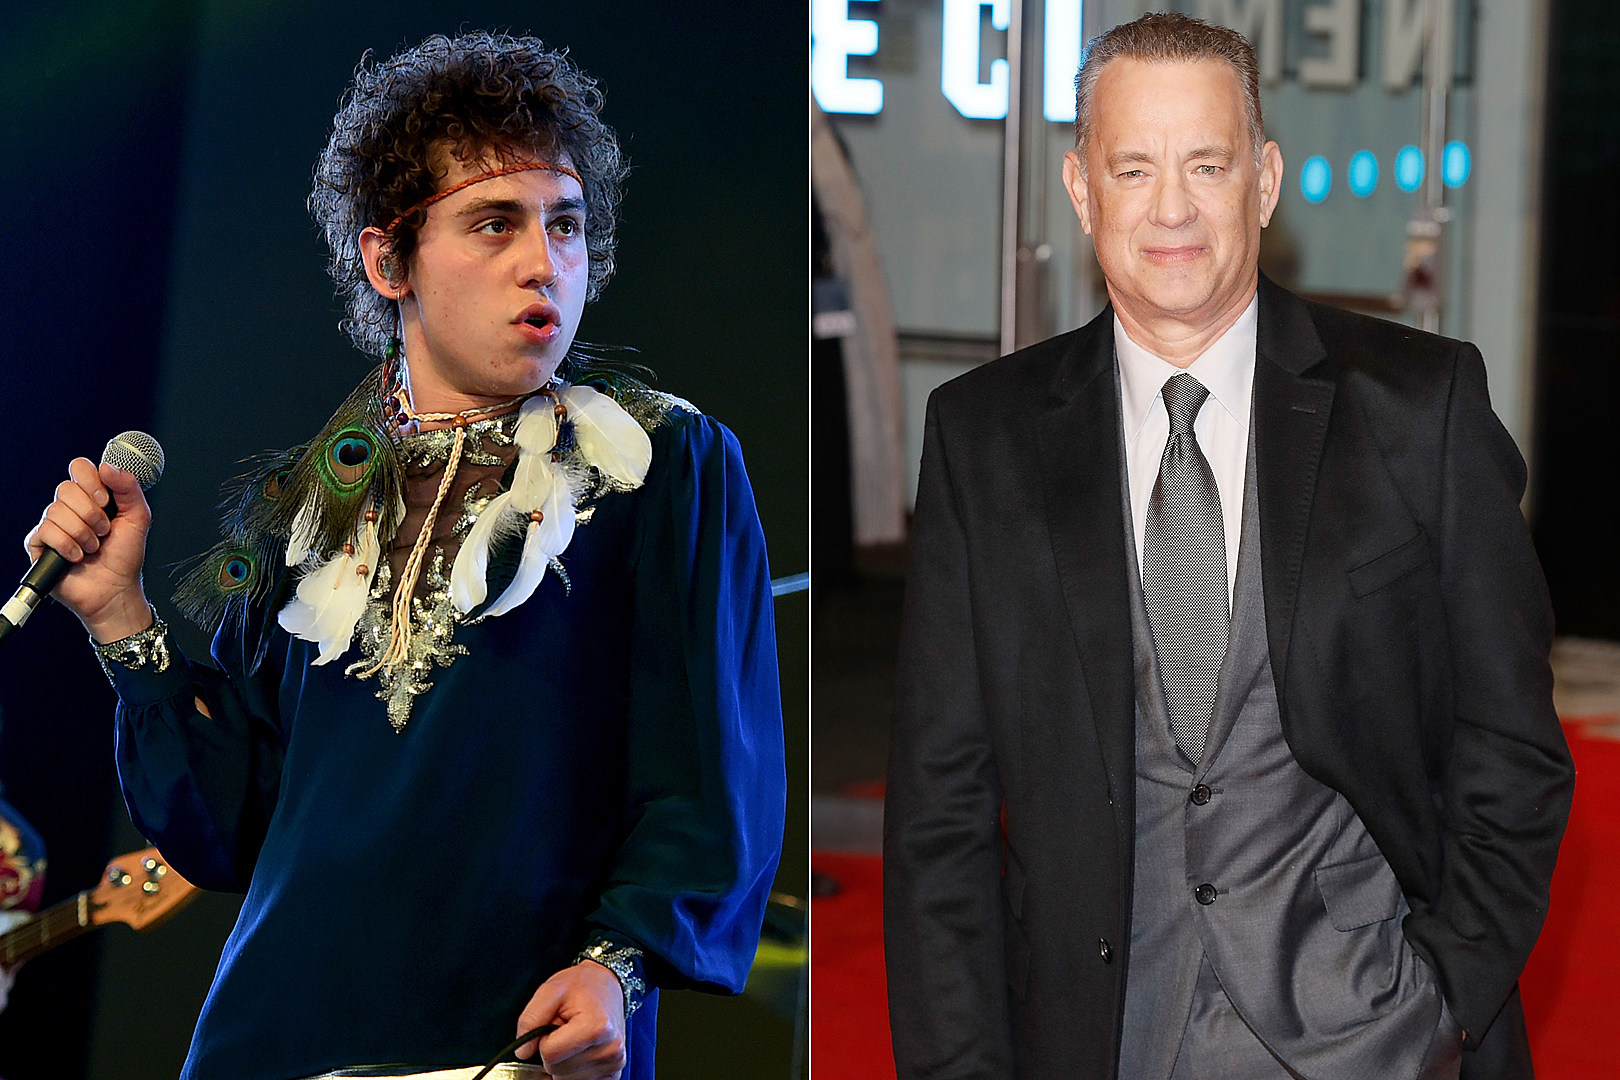 Greta Van Fleet Get Tom Hanks' Approval, Plus News on In This Moment, Burn the Priest + More